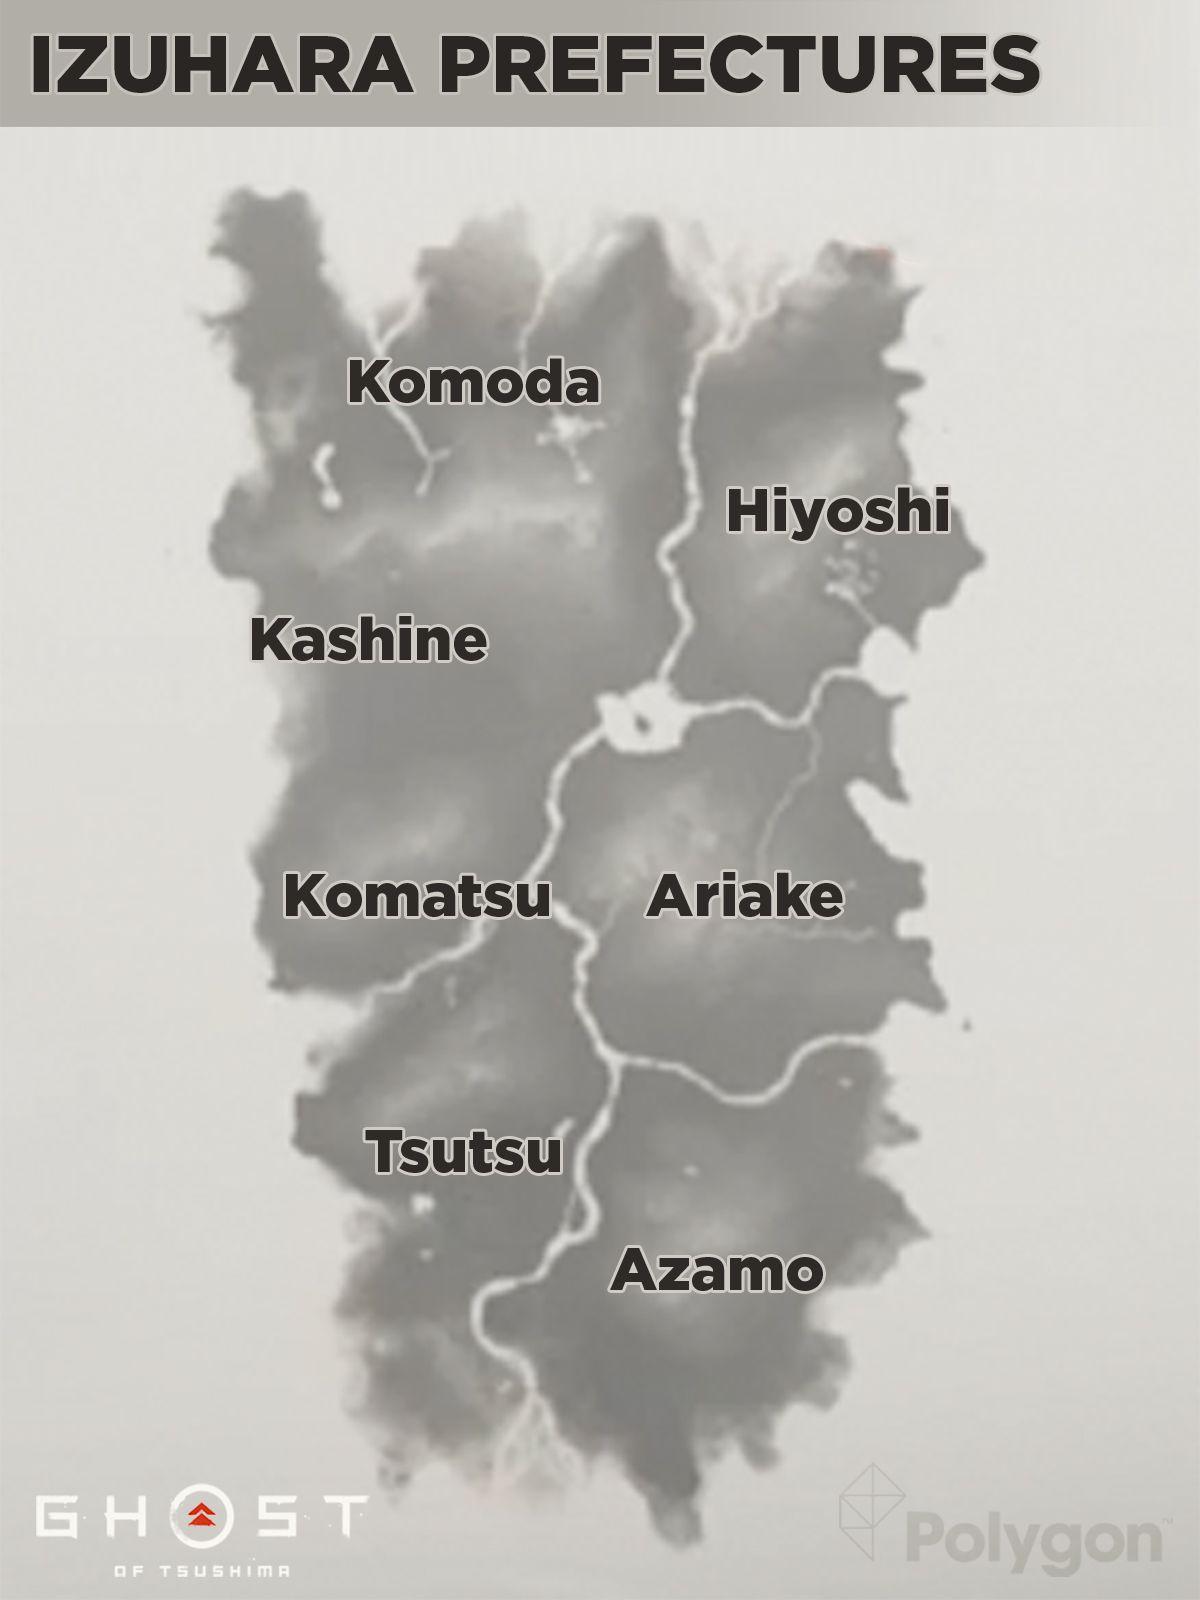 Ghost of Tsushima Izuhara prefectures map